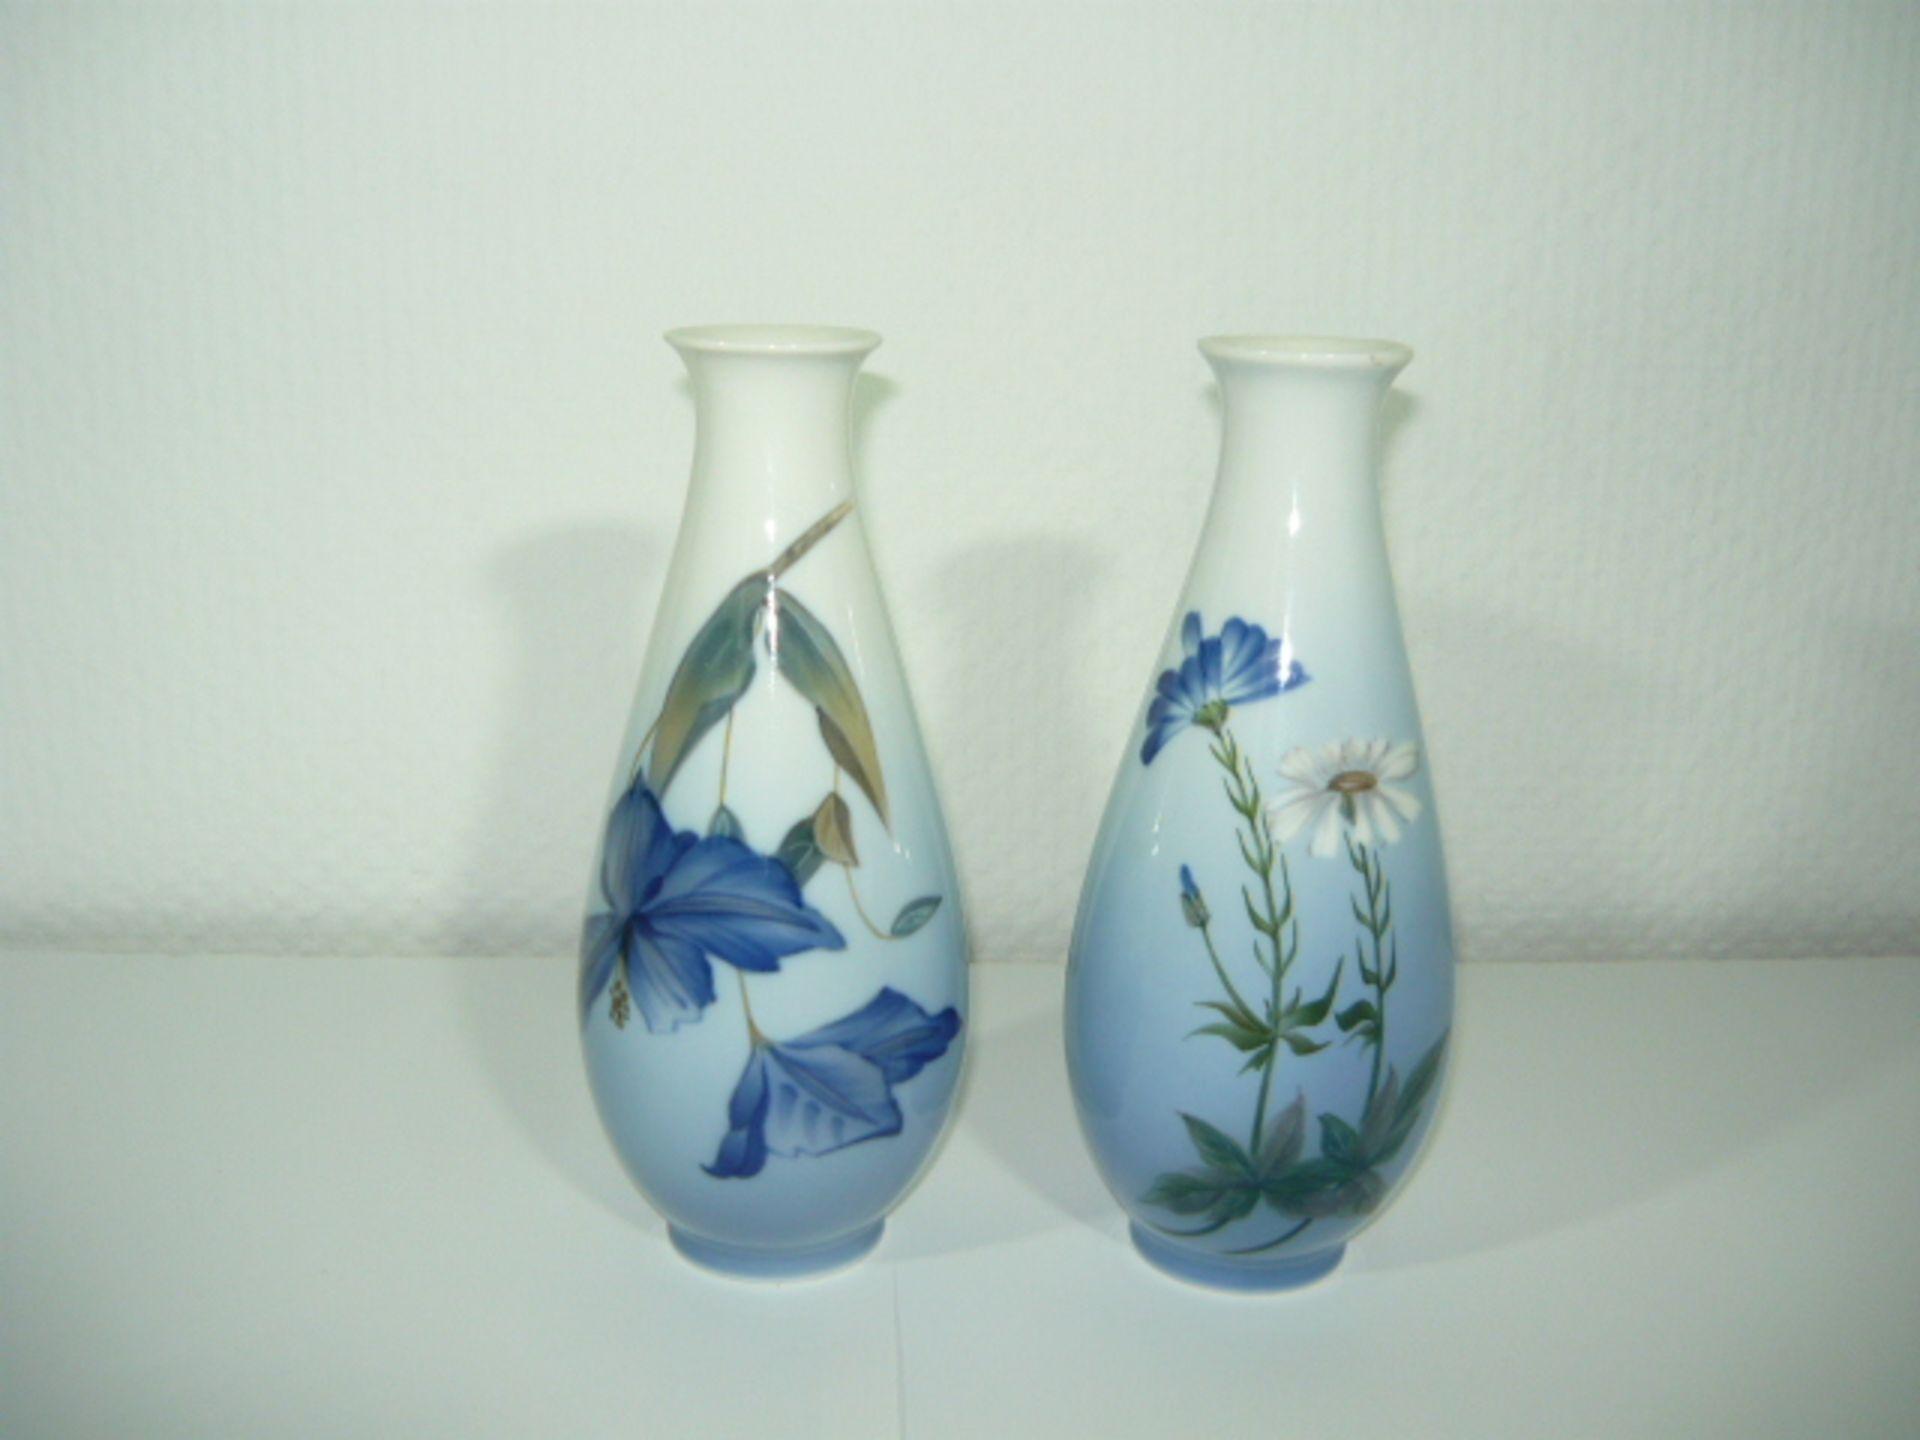 Royal Copenhagen. Paar Vasen mit zarter Blaumalerei. 20.Jhdt. H. je ca. 19cm. KOSTENLOSER VERSAND